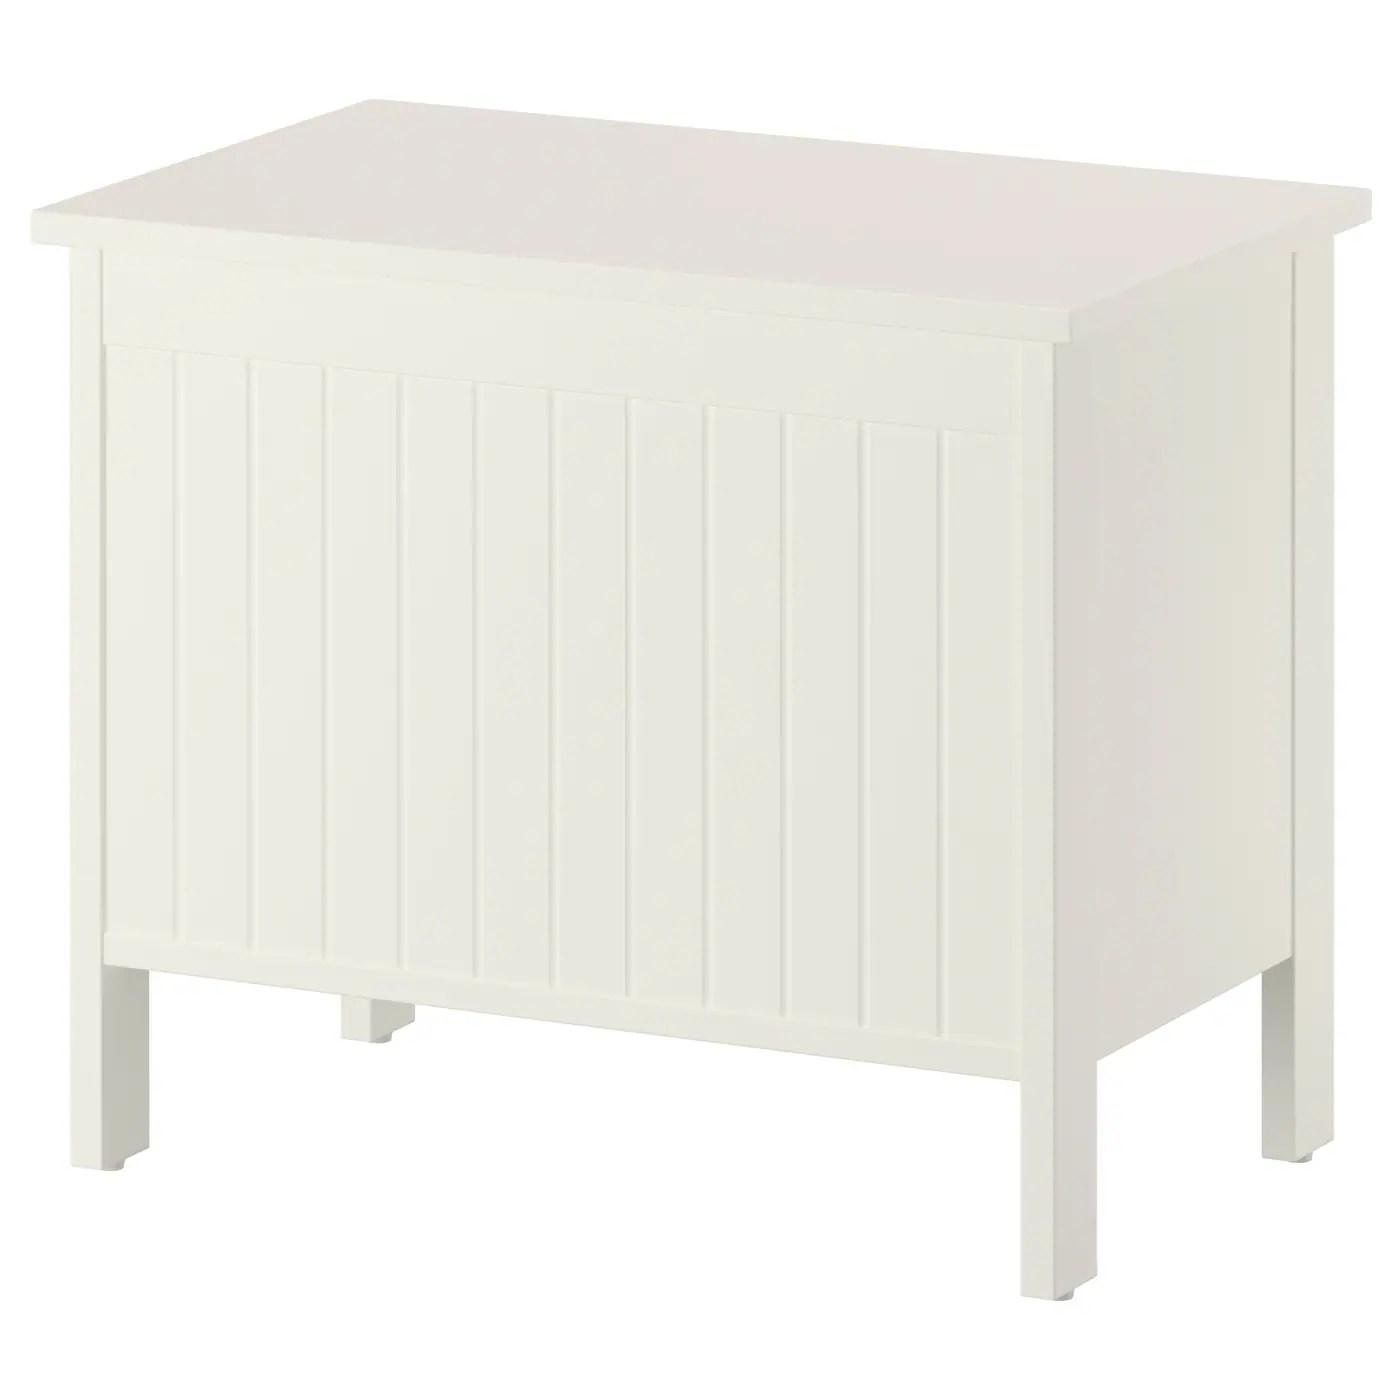 Silveran Banc Coffre Blanc Ca Fr Ikea